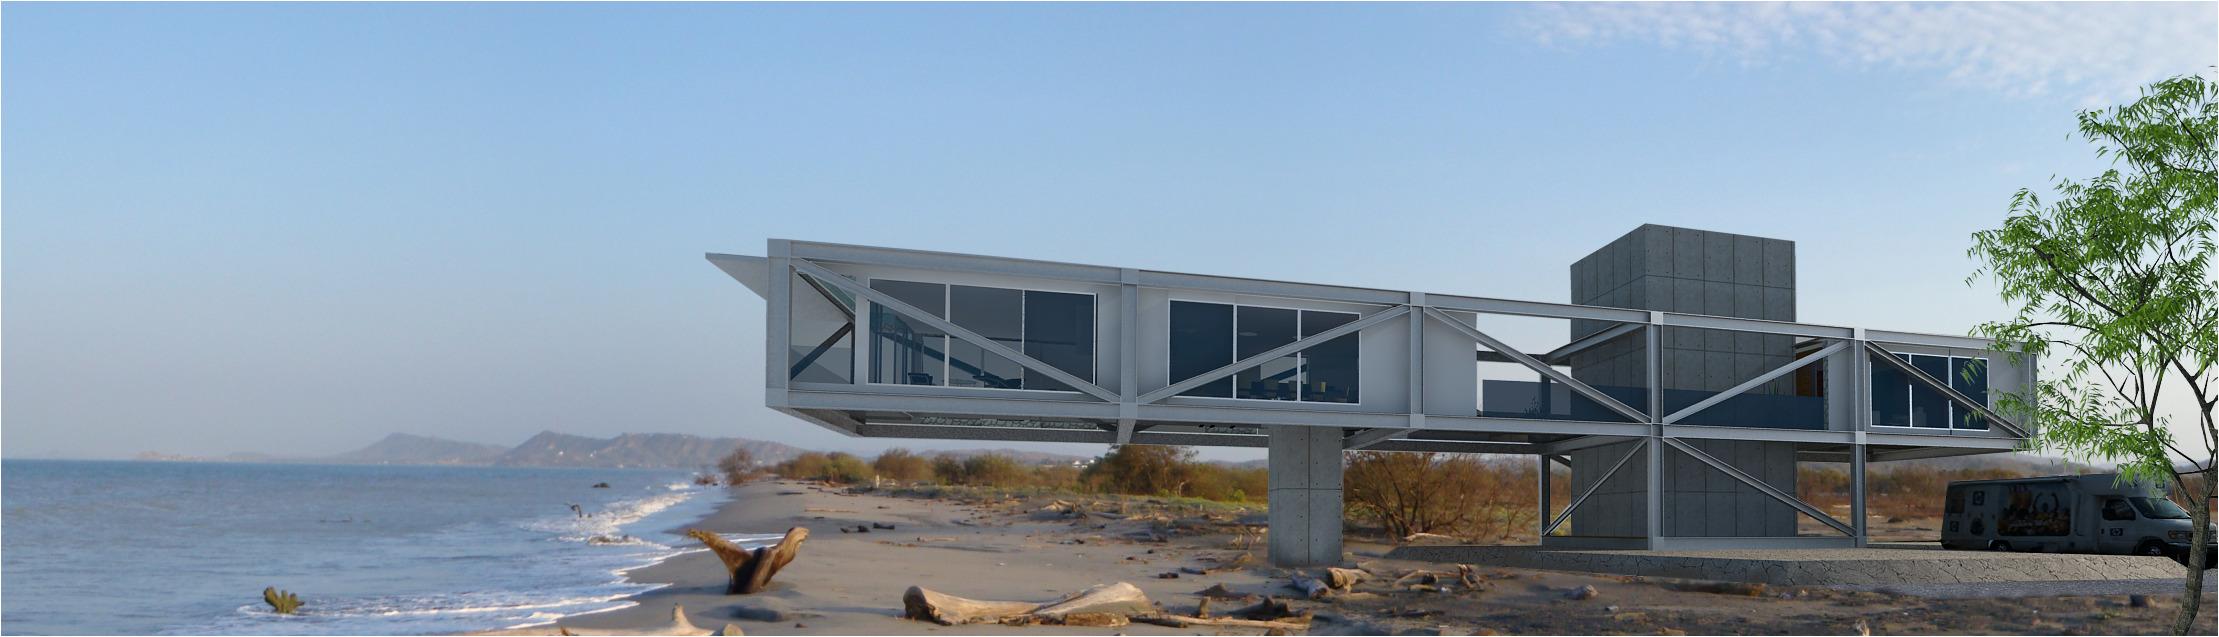 Arquitectura Cimientos & Creatividad (@schadids) Cover Image